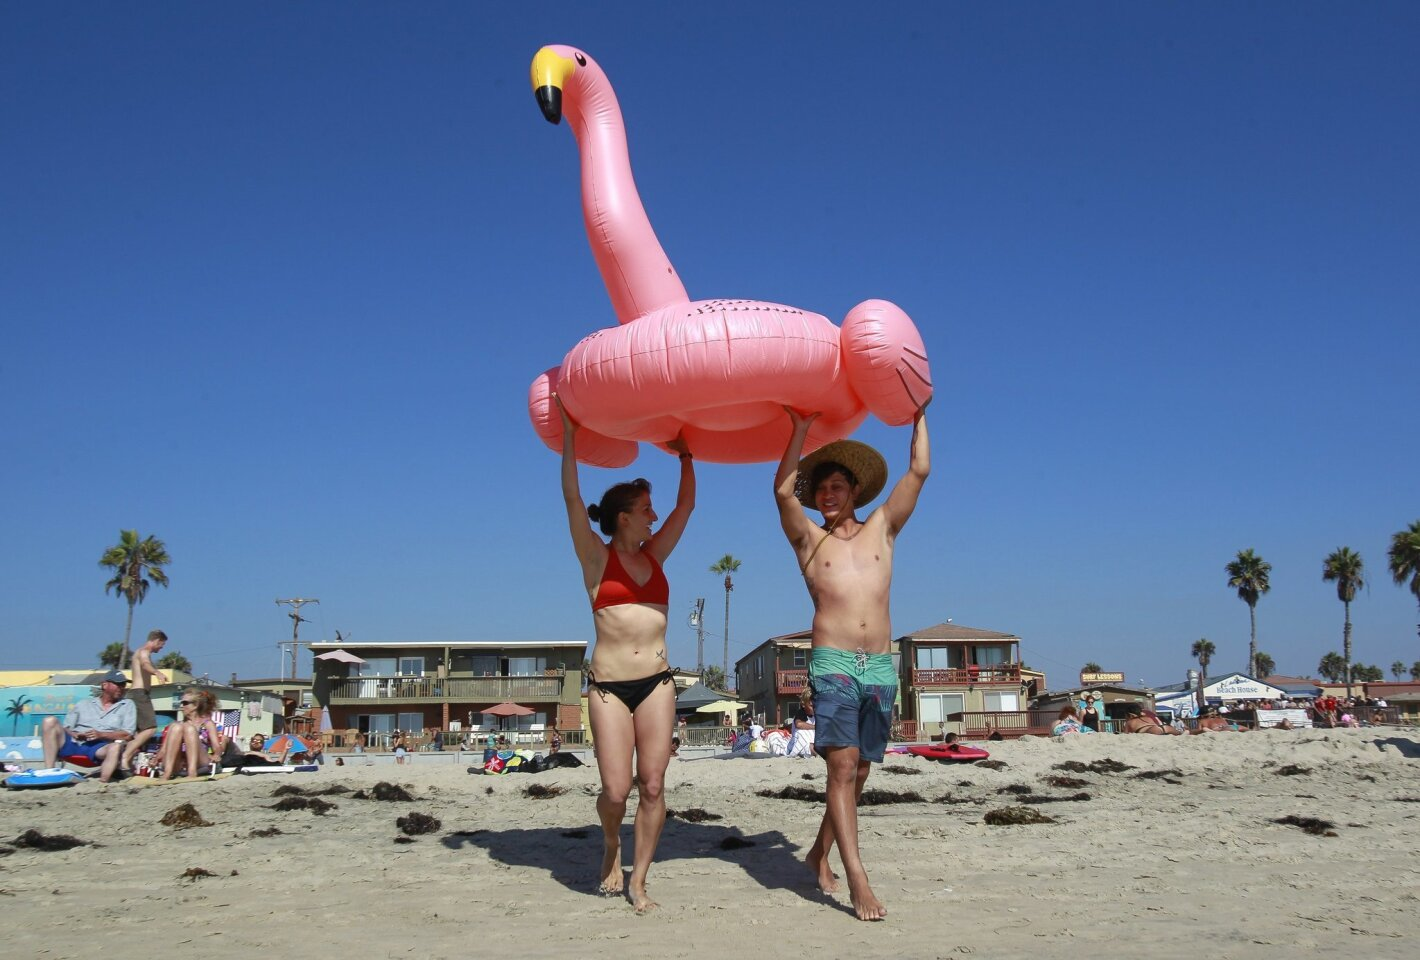 San Diego/Beach/Labor Day 2106